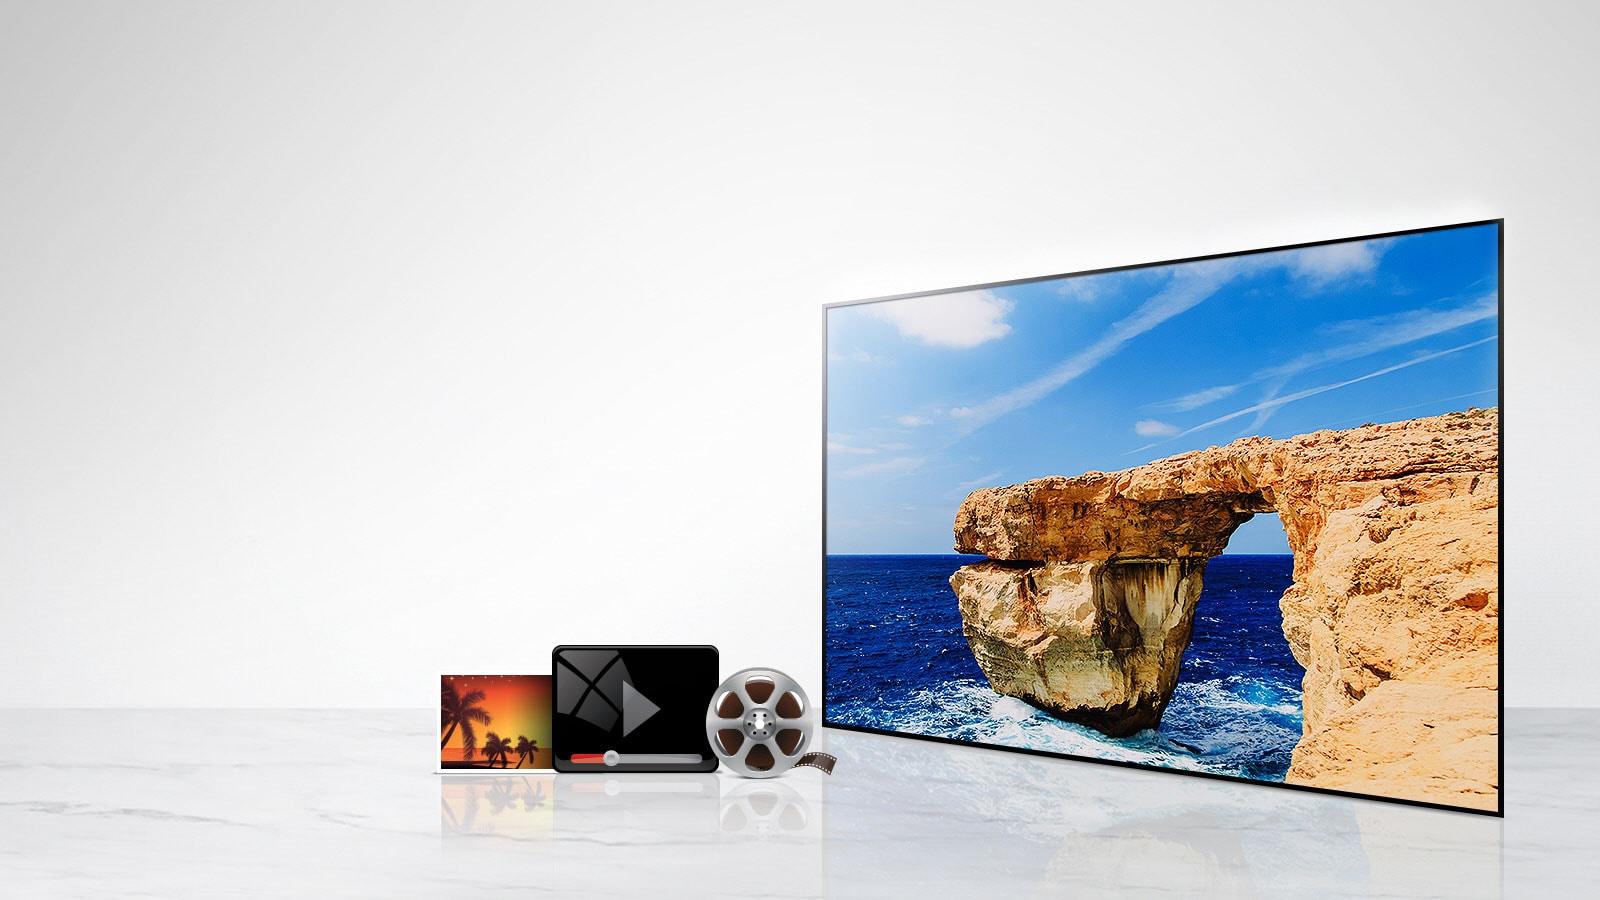 تلویزیون 32 اینچ FULL HD ال جی مدل LJ510V